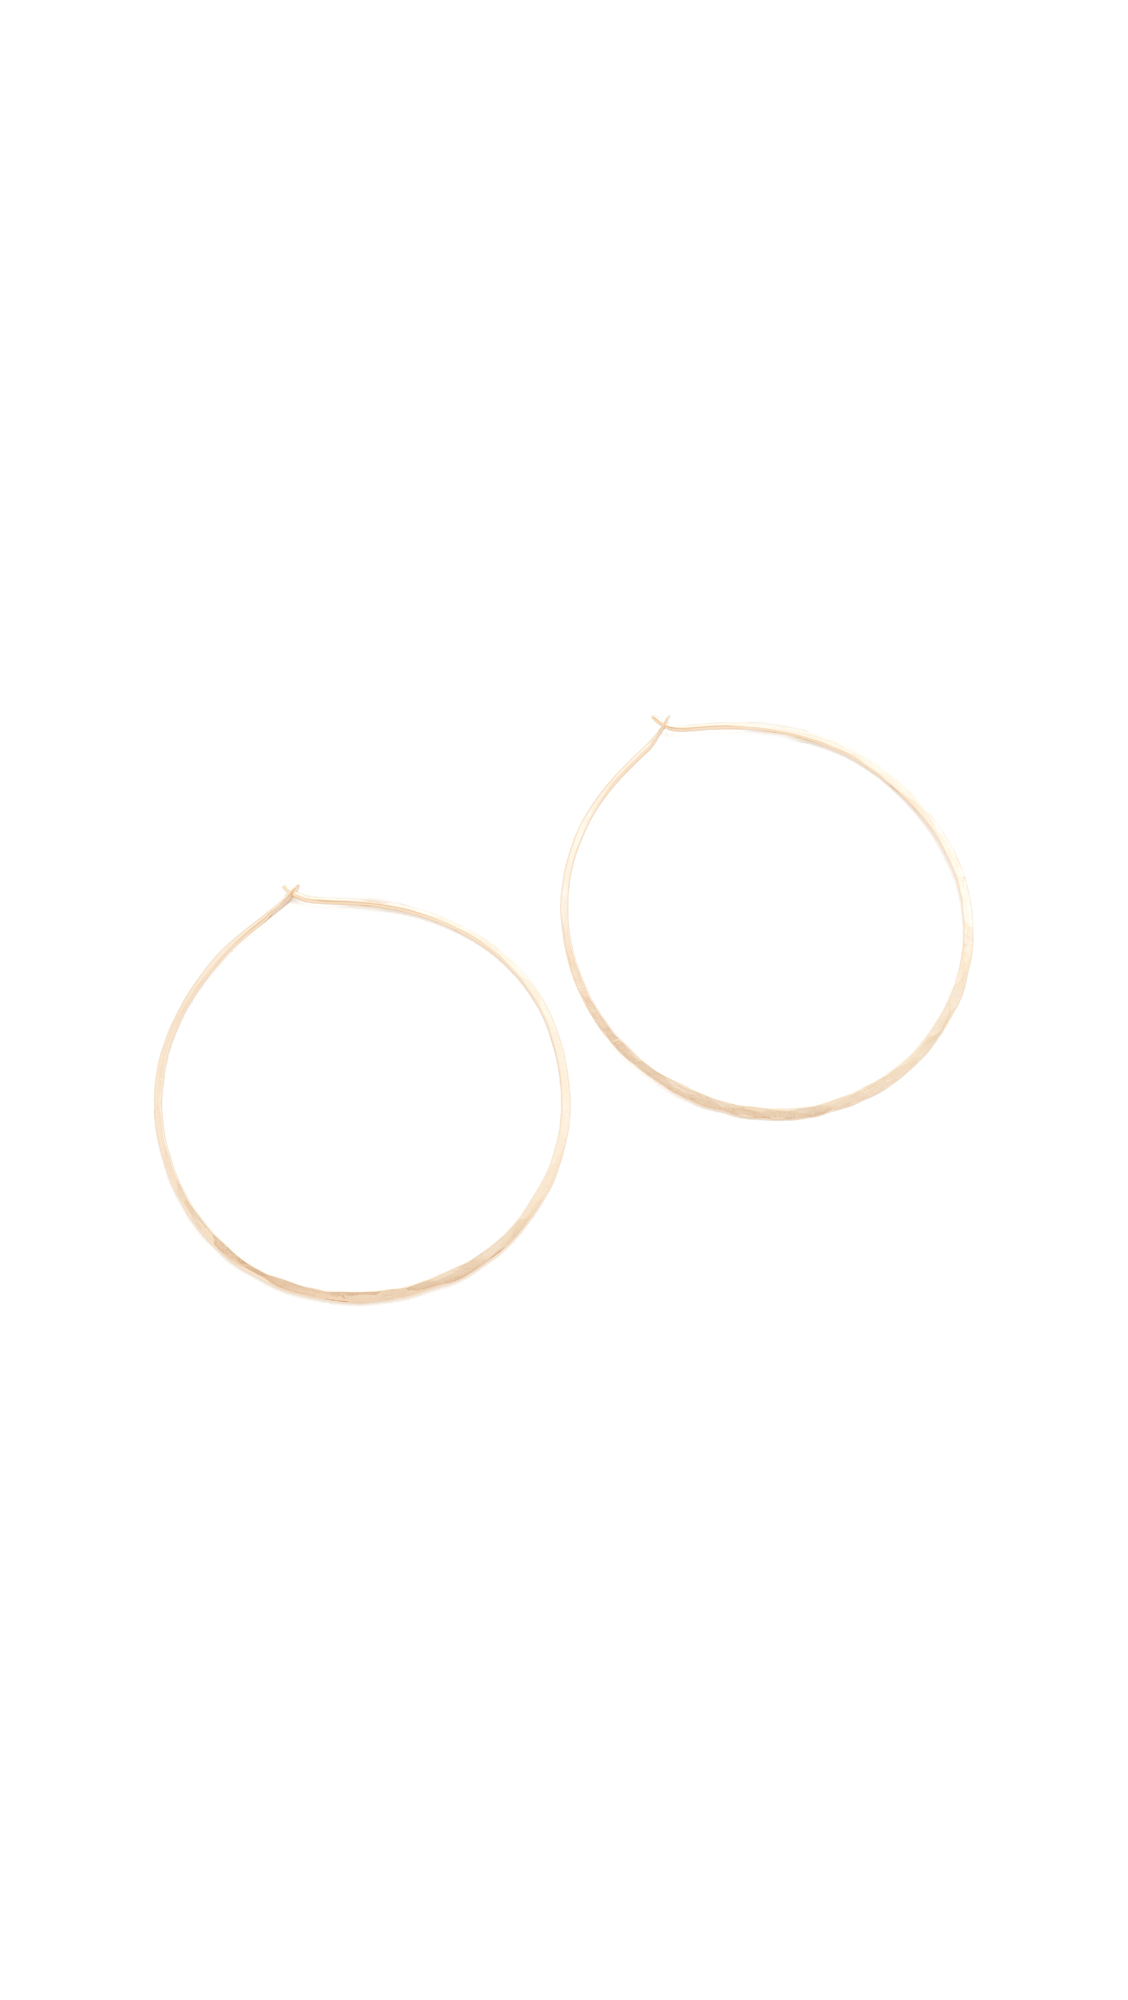 blanca monros gomez 14k Gold Summer Hoop Earrings - Gold